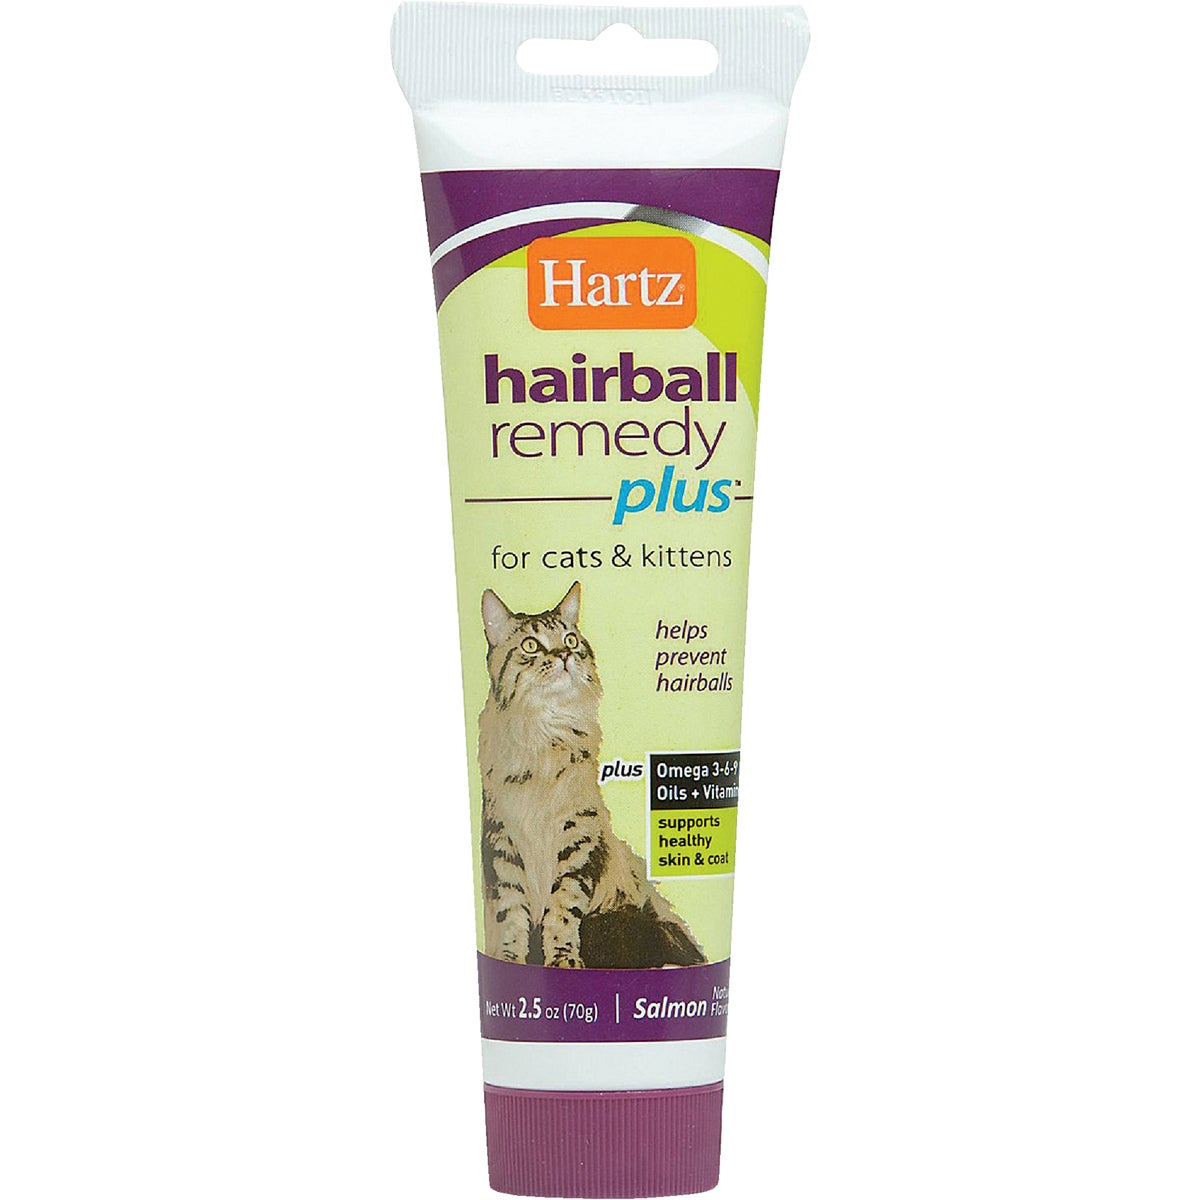 3OZ SALMN HAIRBAL REMEDY - 95009 by Hartz Mountain Corp